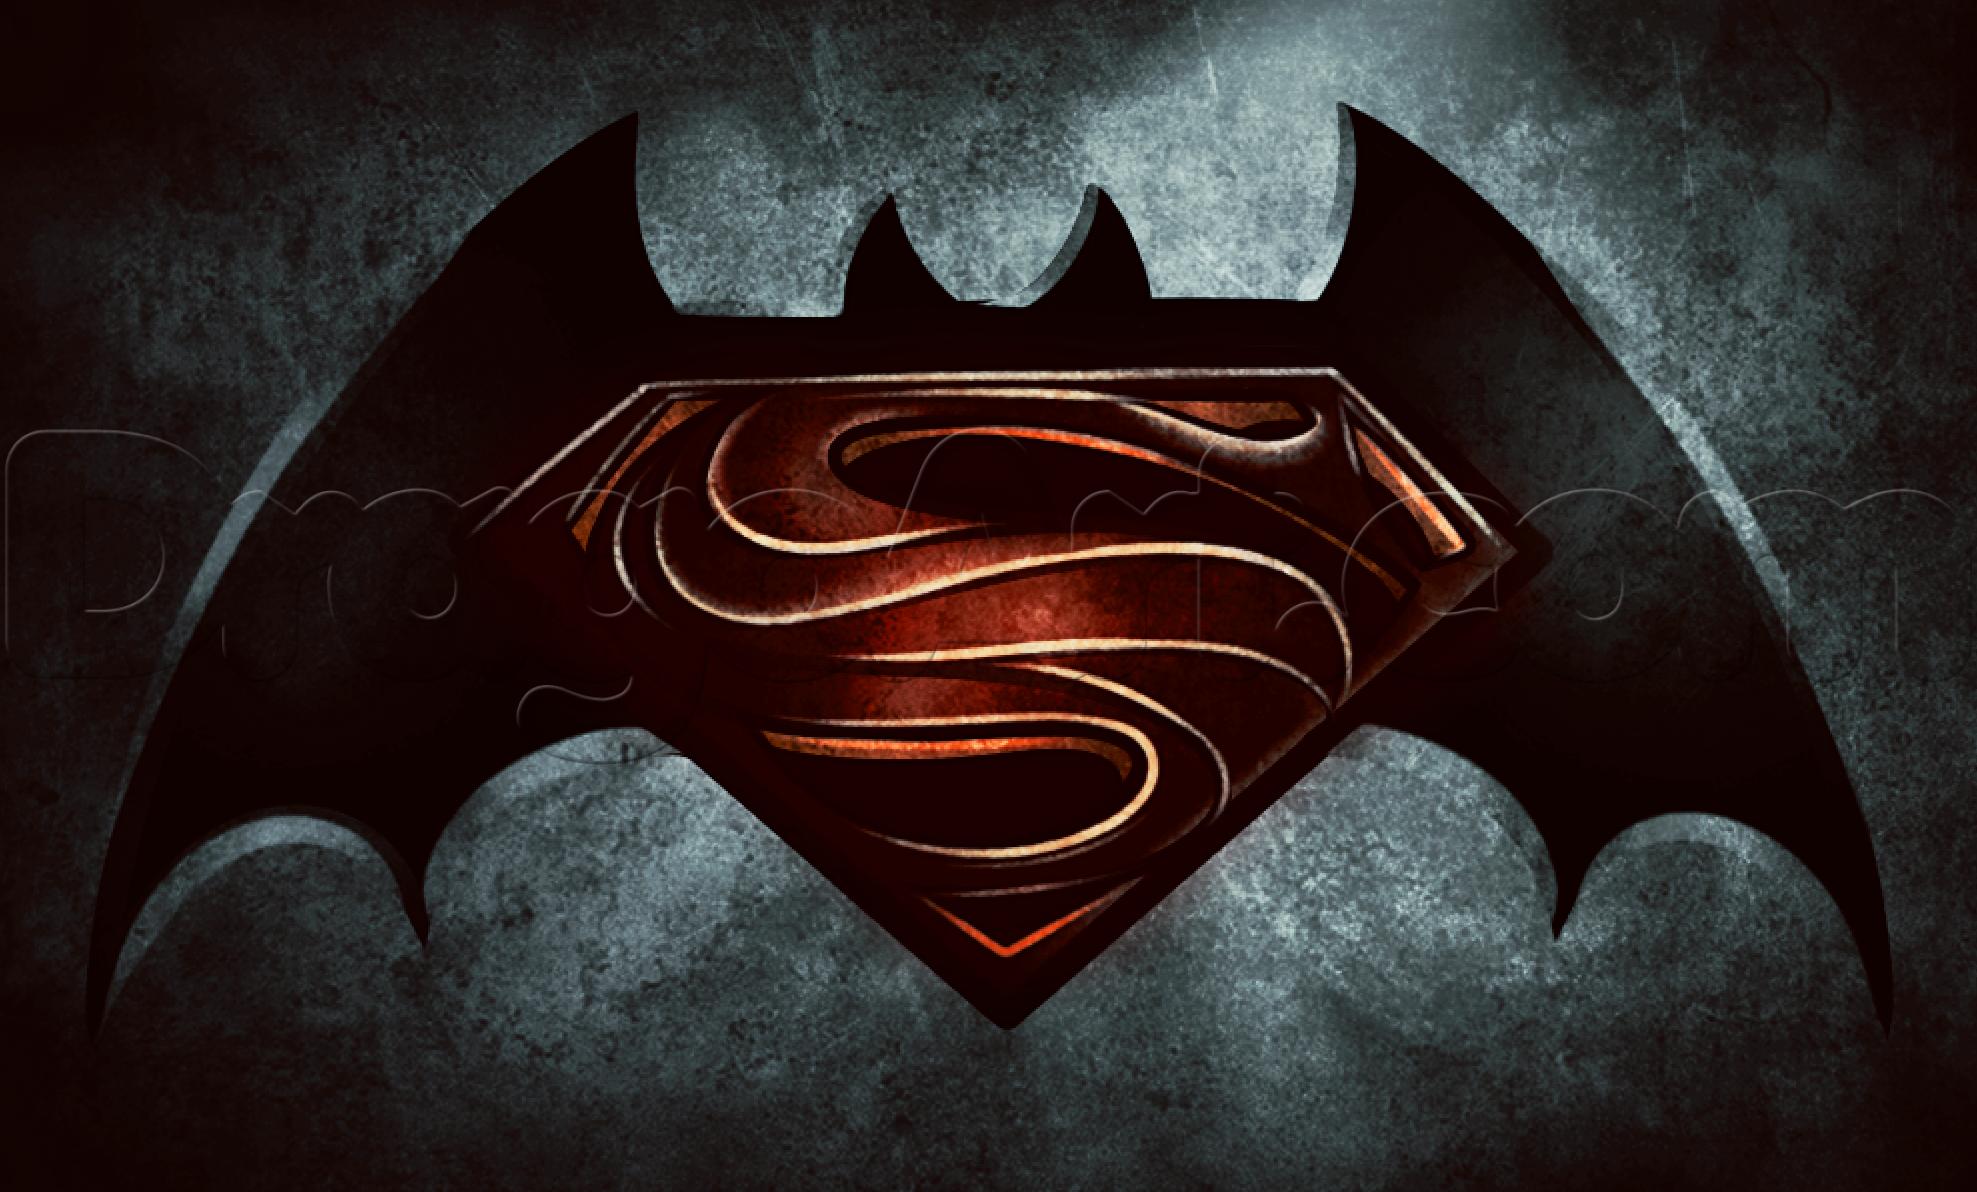 How To Draw Batman Vs Superman Step By Step Dc Comics Comics Free Online Drawing Tutorial Added By Dawn M Batman Drawing Superman Drawing Superman Symbol